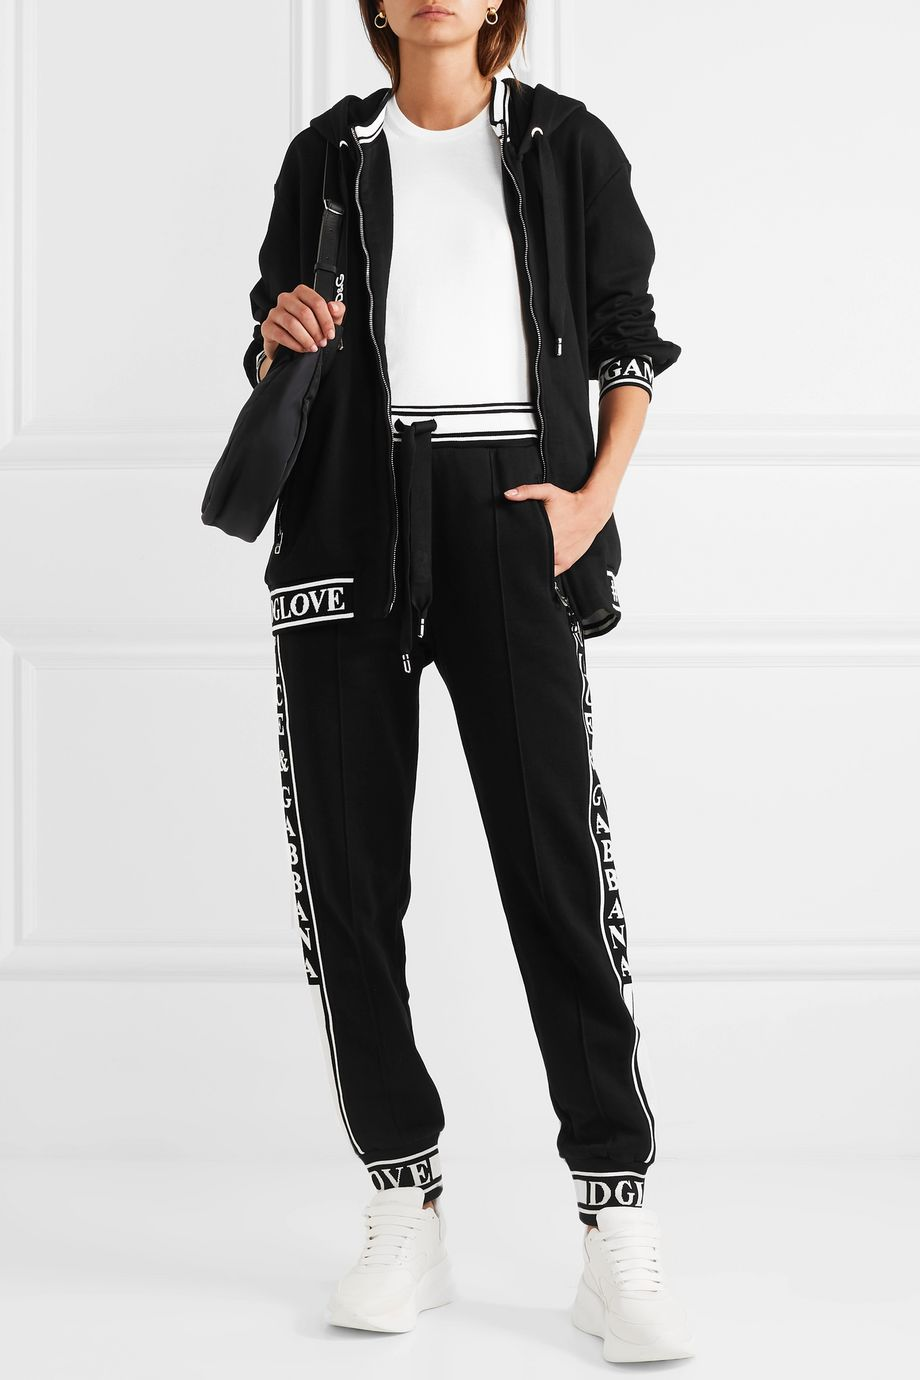 Dolce & Gabbana Jacquard-trimmed cotton-jersey track pants